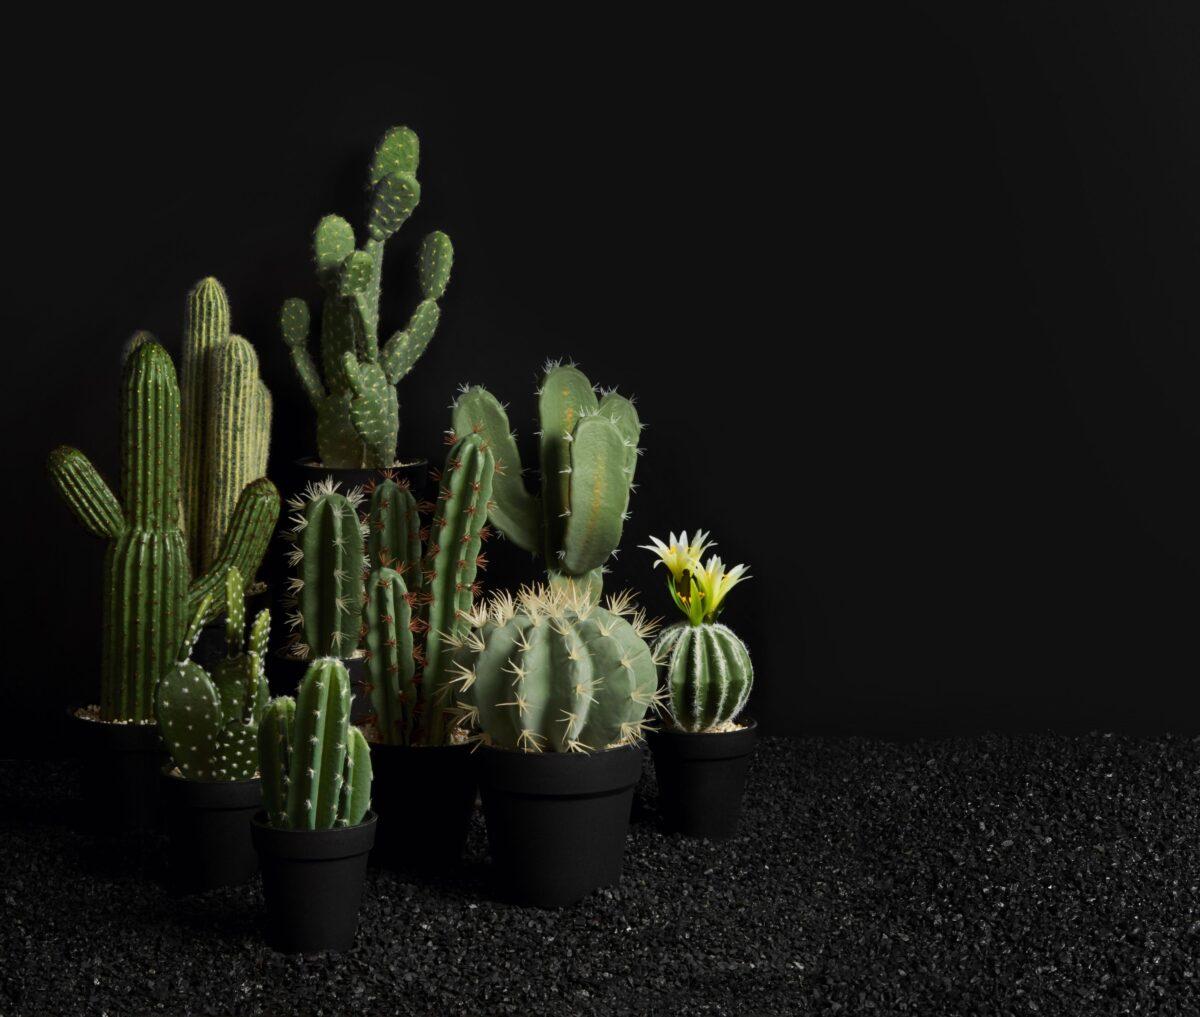 66201444 1r9IcfBvVwAnfg 1200x1017 - Decor Cactus Asa Selection (66212444)